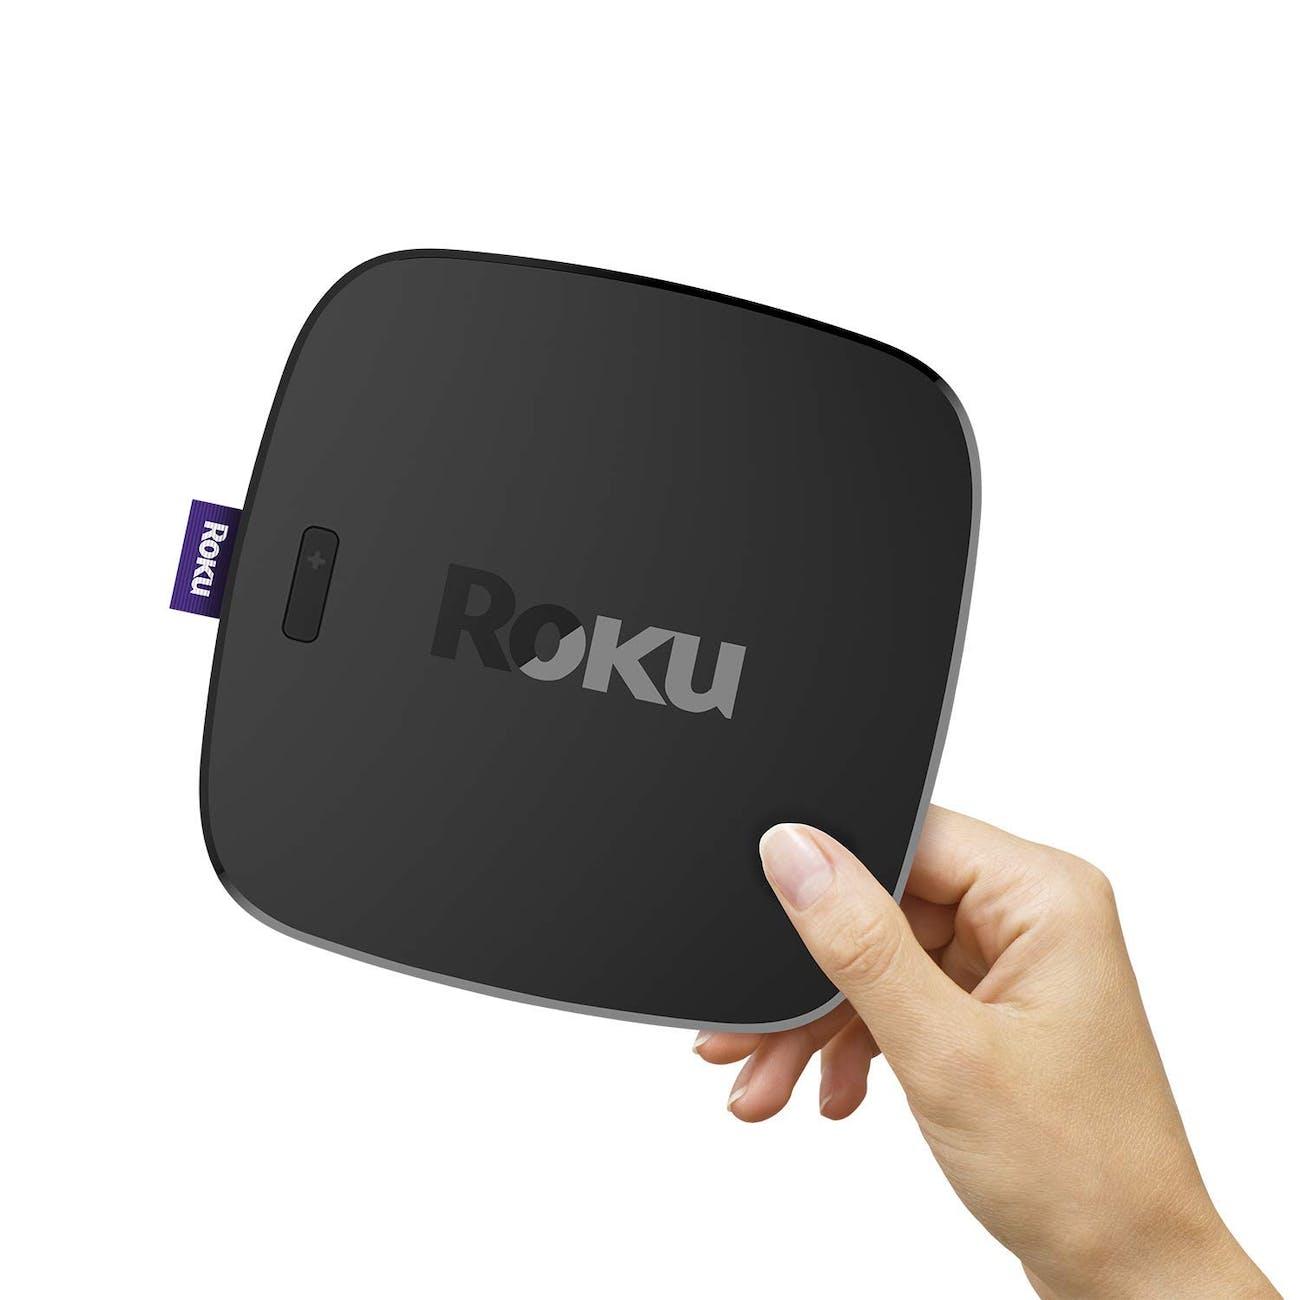 Roku Ultra | HD/4K/HDR Streaming Media Player. Now includes Premium JBL Headphones. (2018)